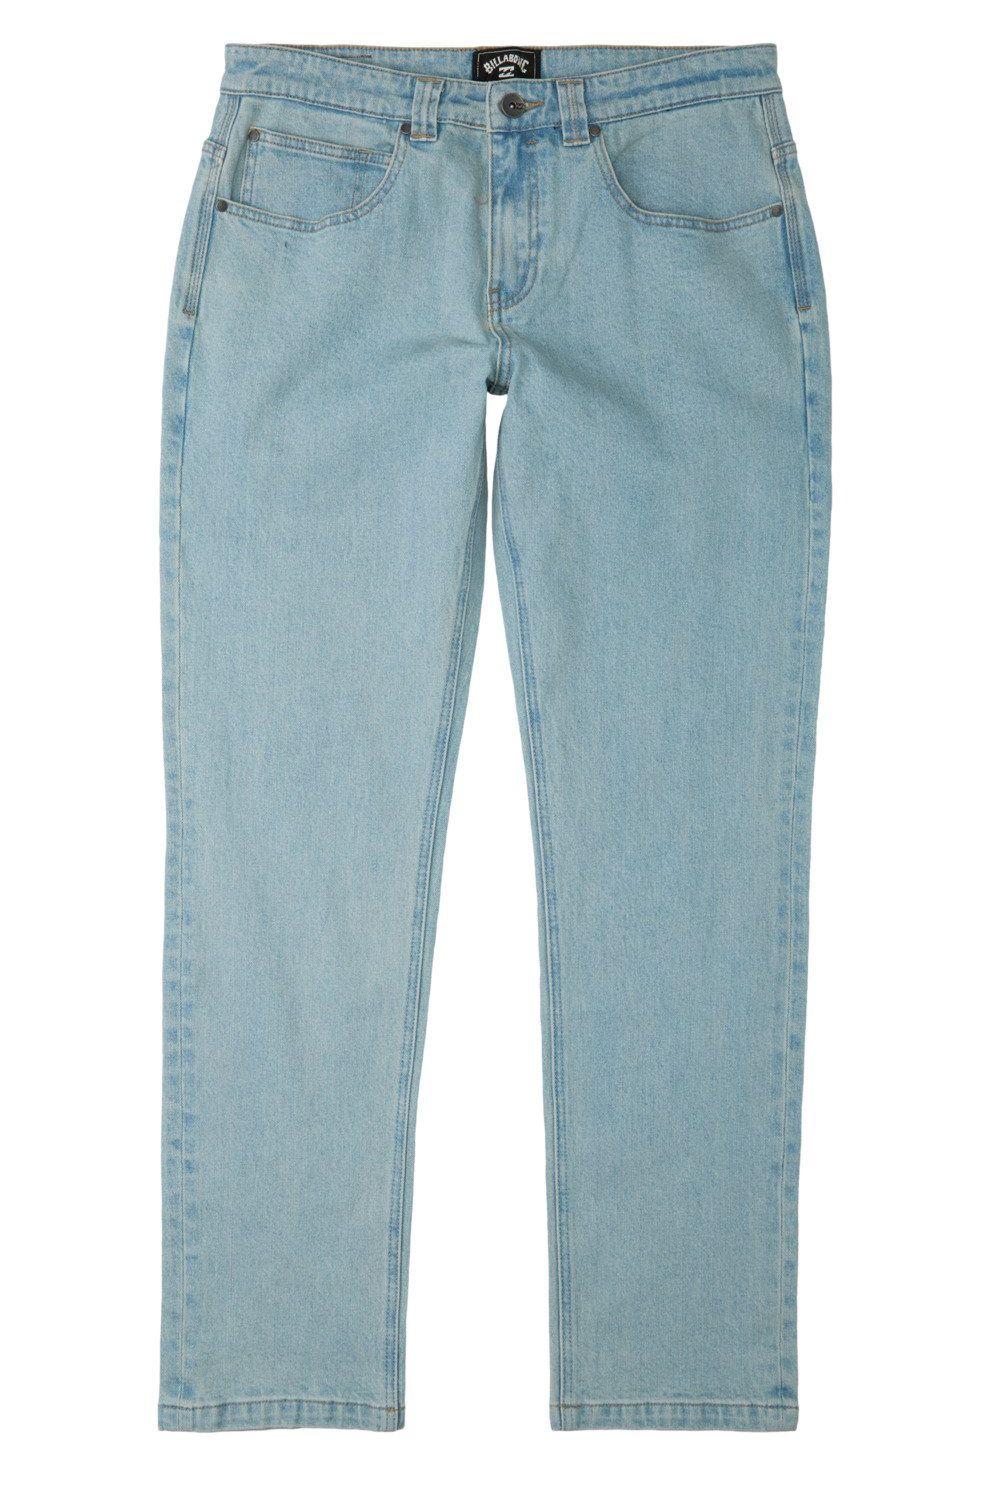 Billabong Pant Jeans 73 JEAN Indigo Overcast